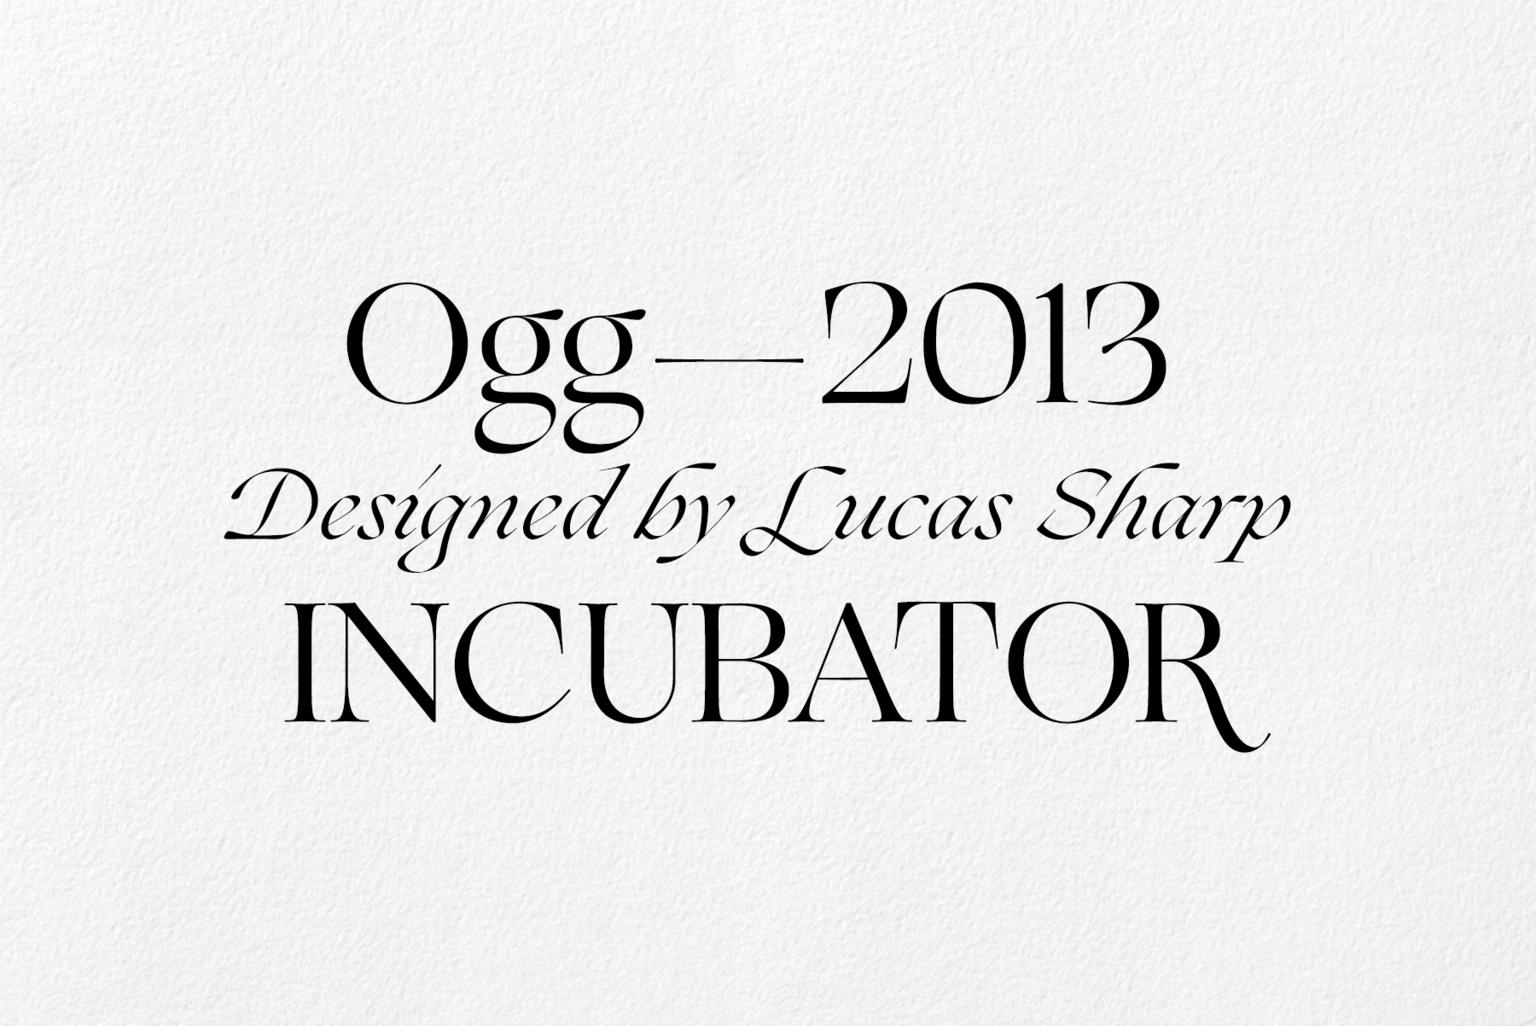 Vllg incubator ogg